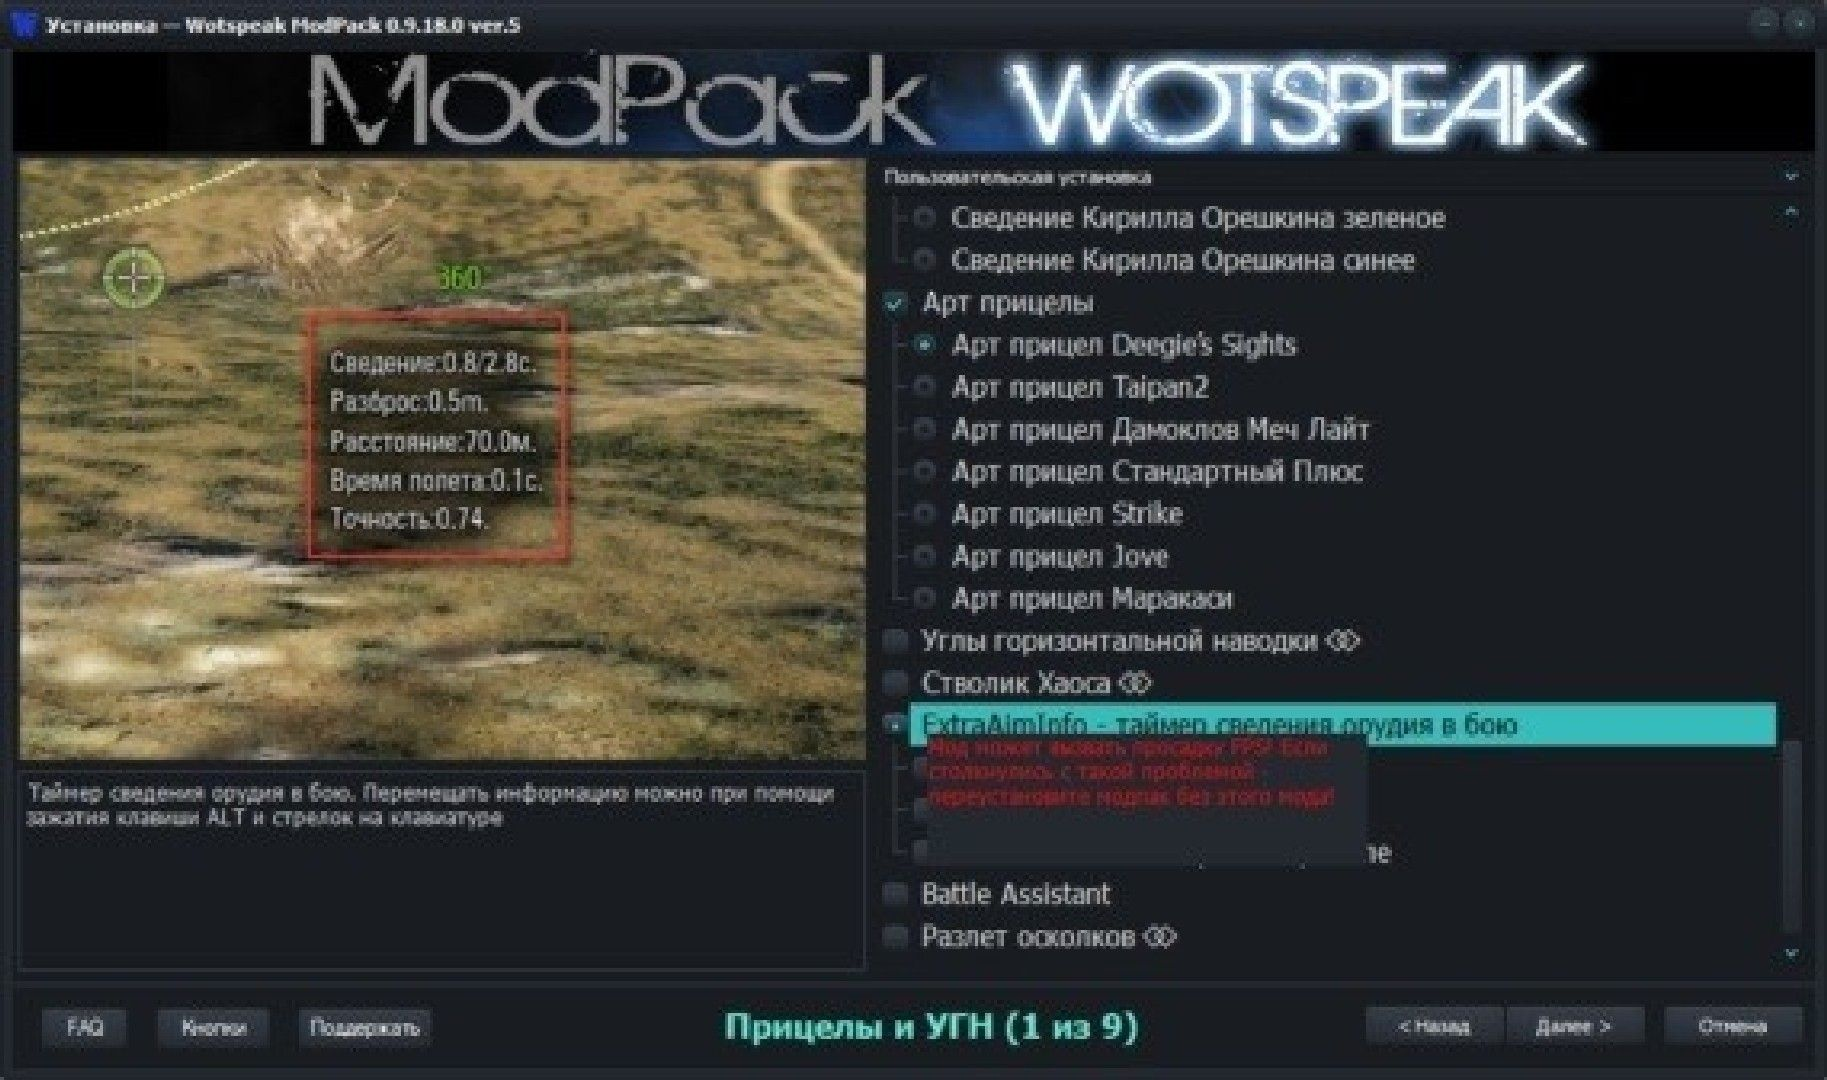 читы для world of tanks d mod